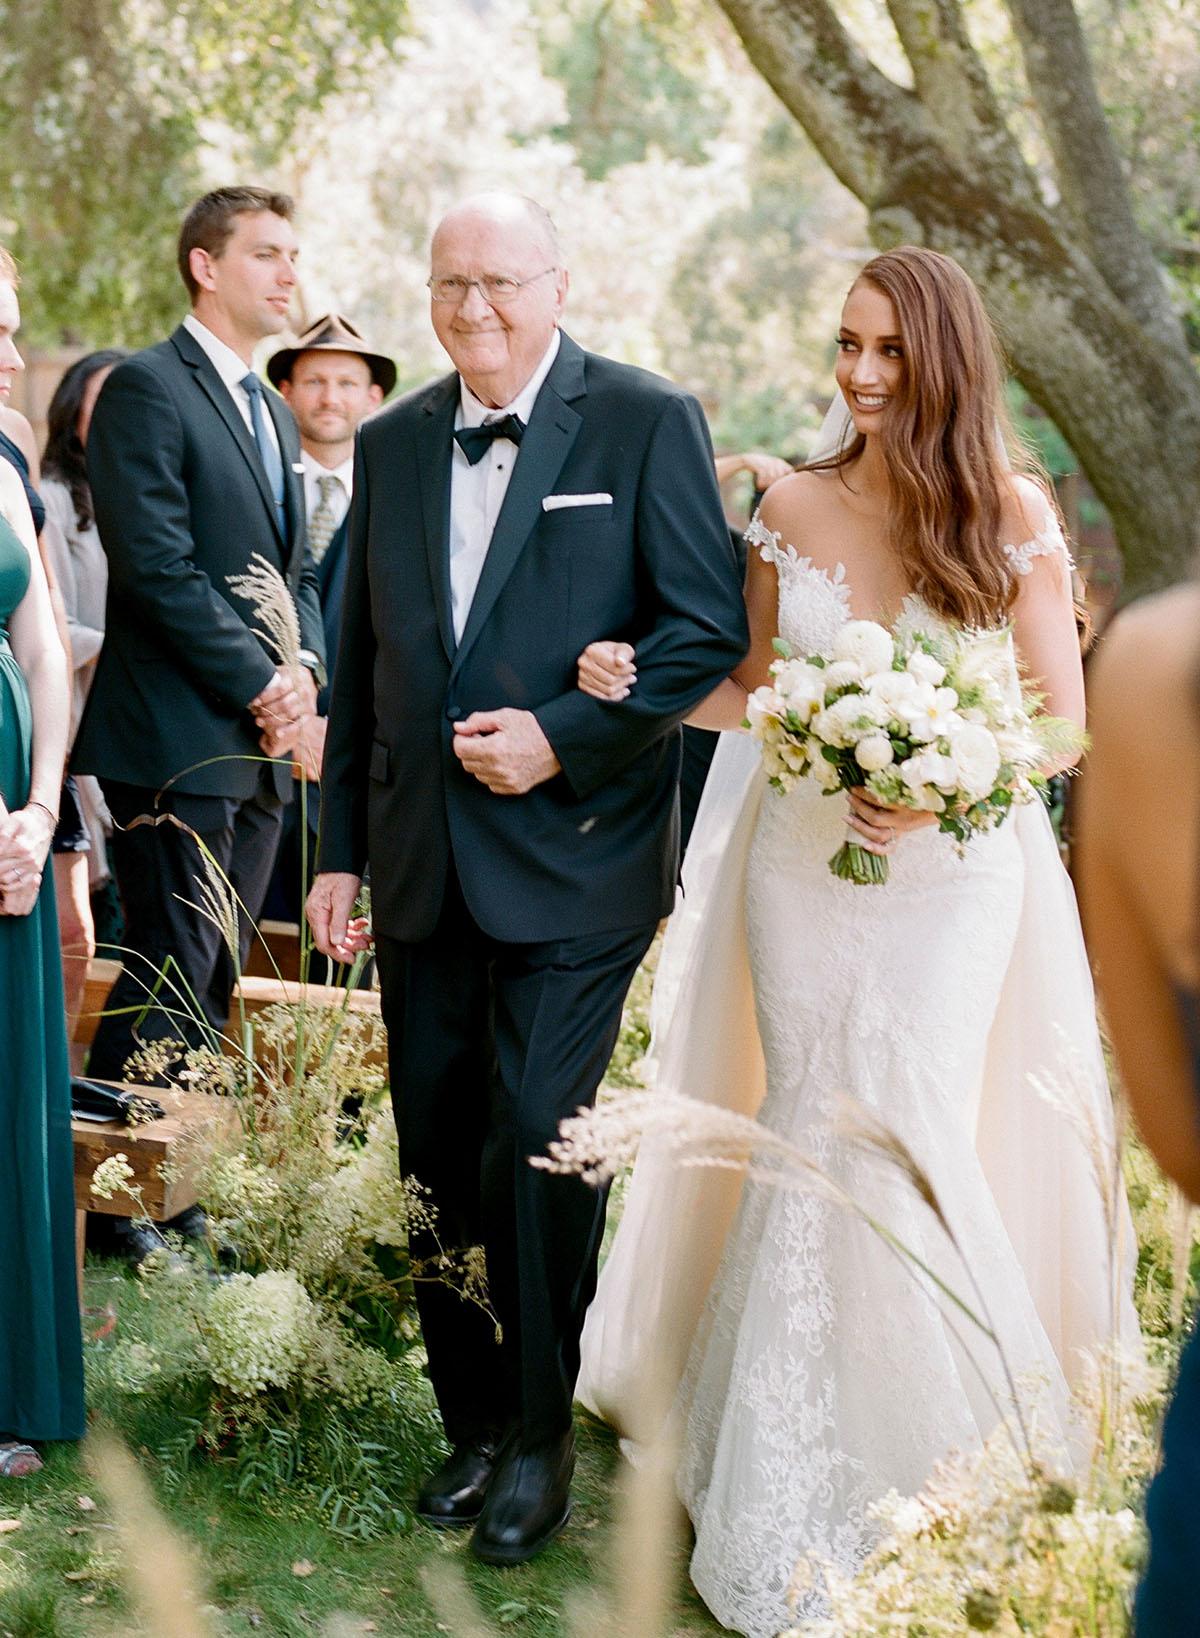 13-bride-grandpa-walking-aisle-processional.jpg